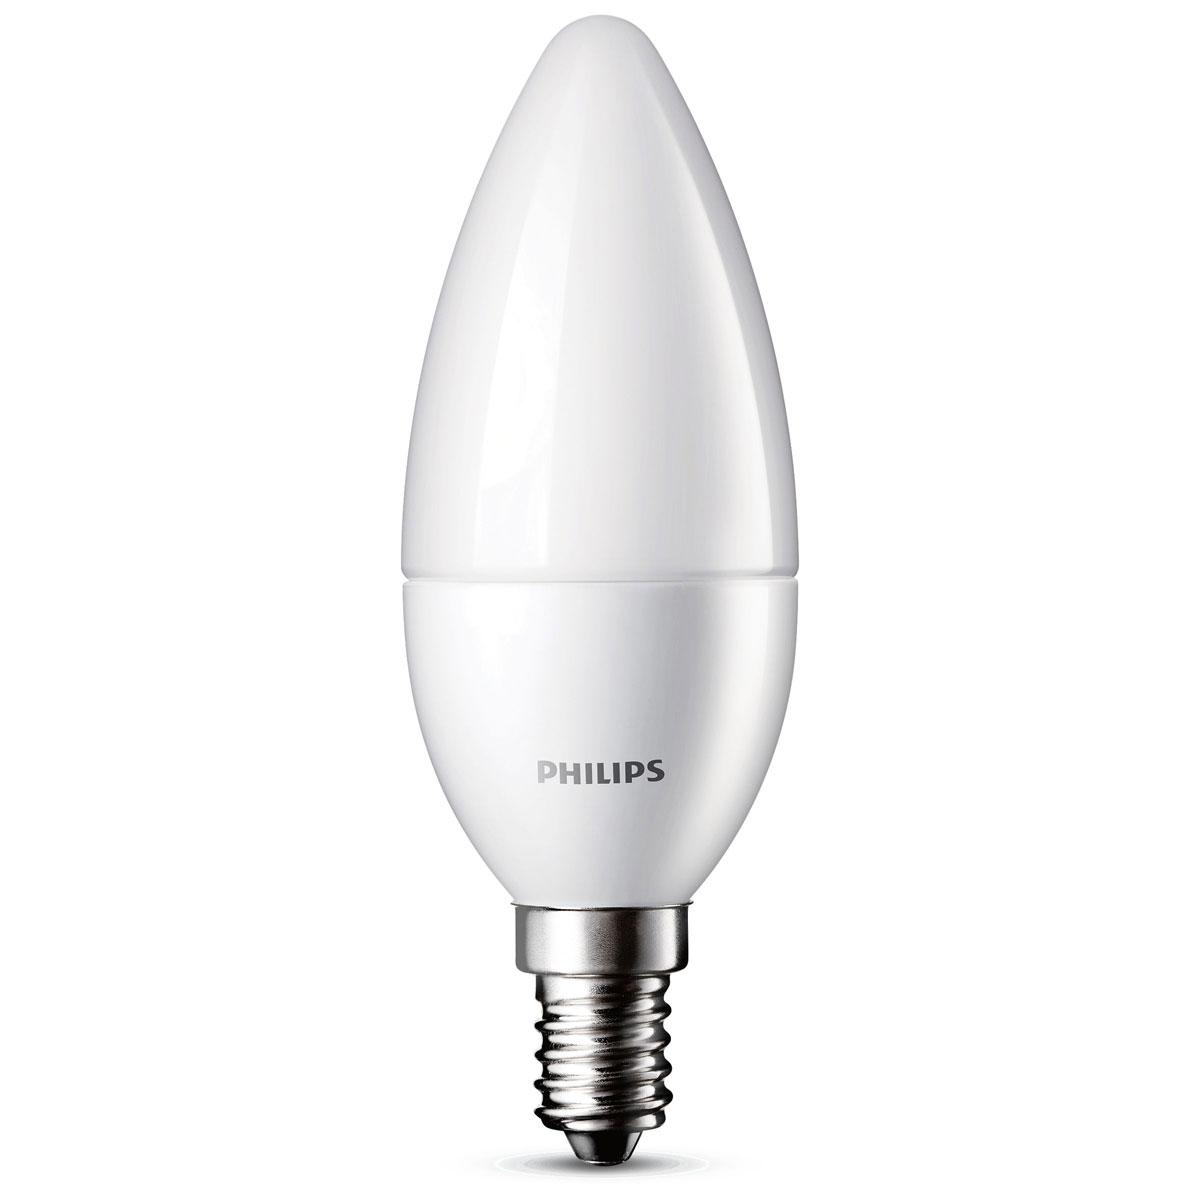 philips led lamp kaars mat 3w 25w e14. Black Bedroom Furniture Sets. Home Design Ideas